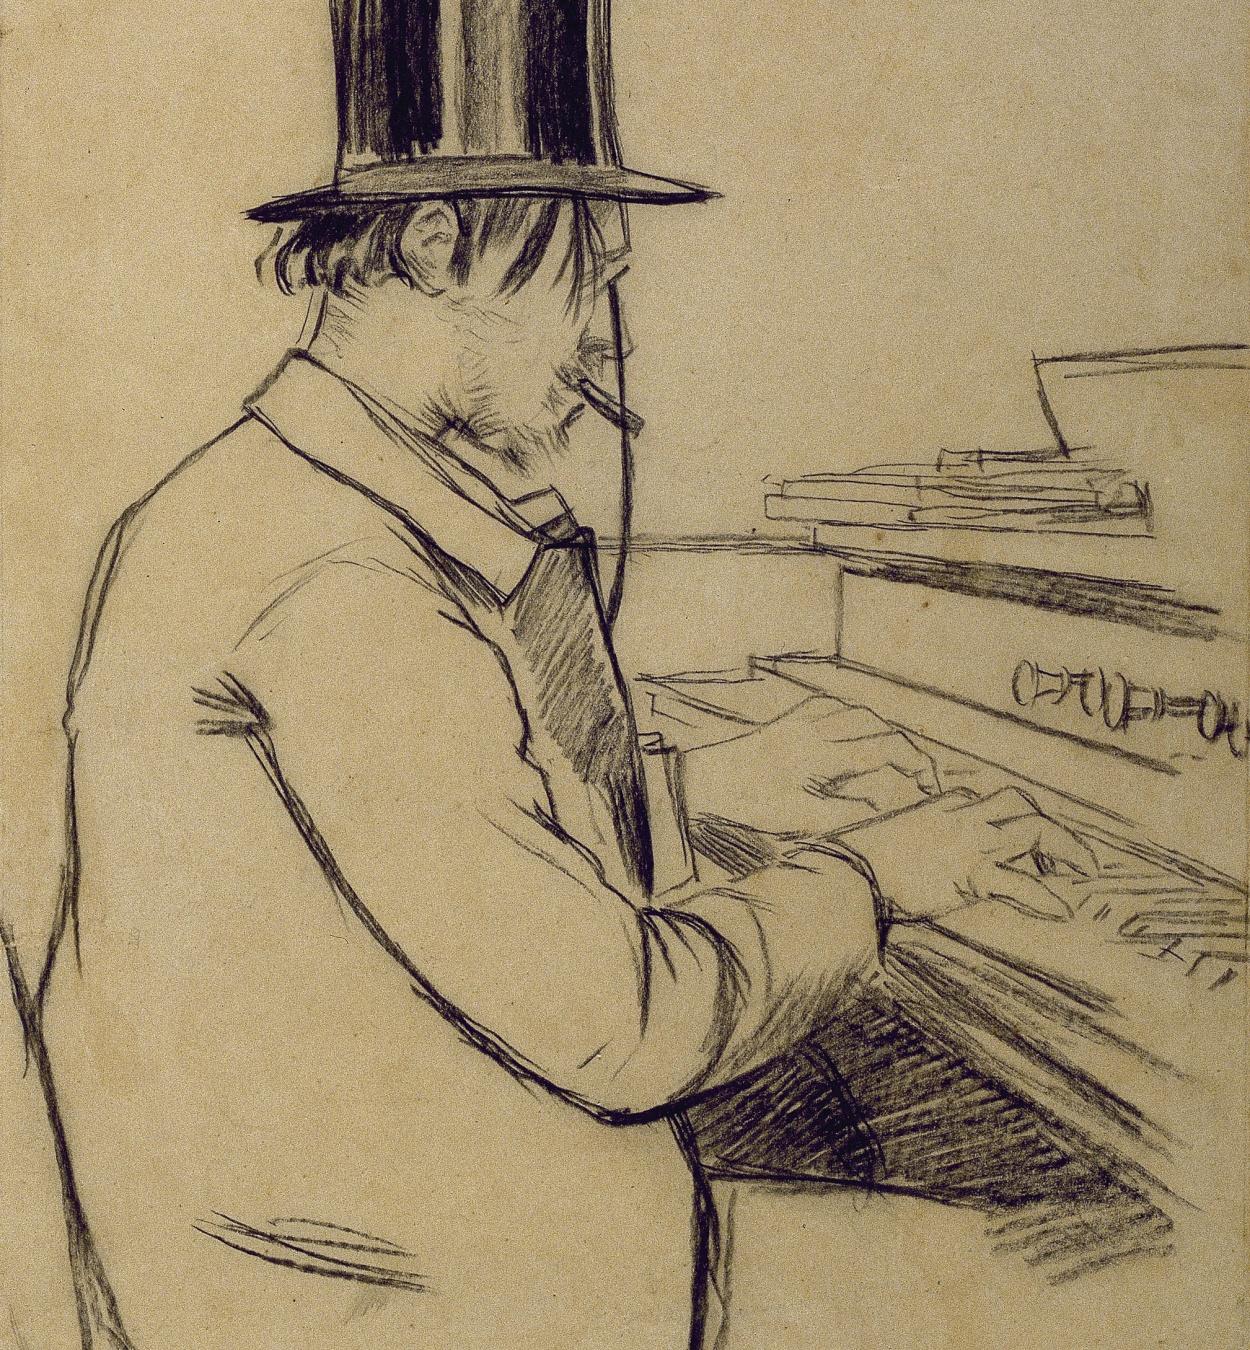 Santiago Rusiñol - Erik Satie Playing the Harmonium - 1891